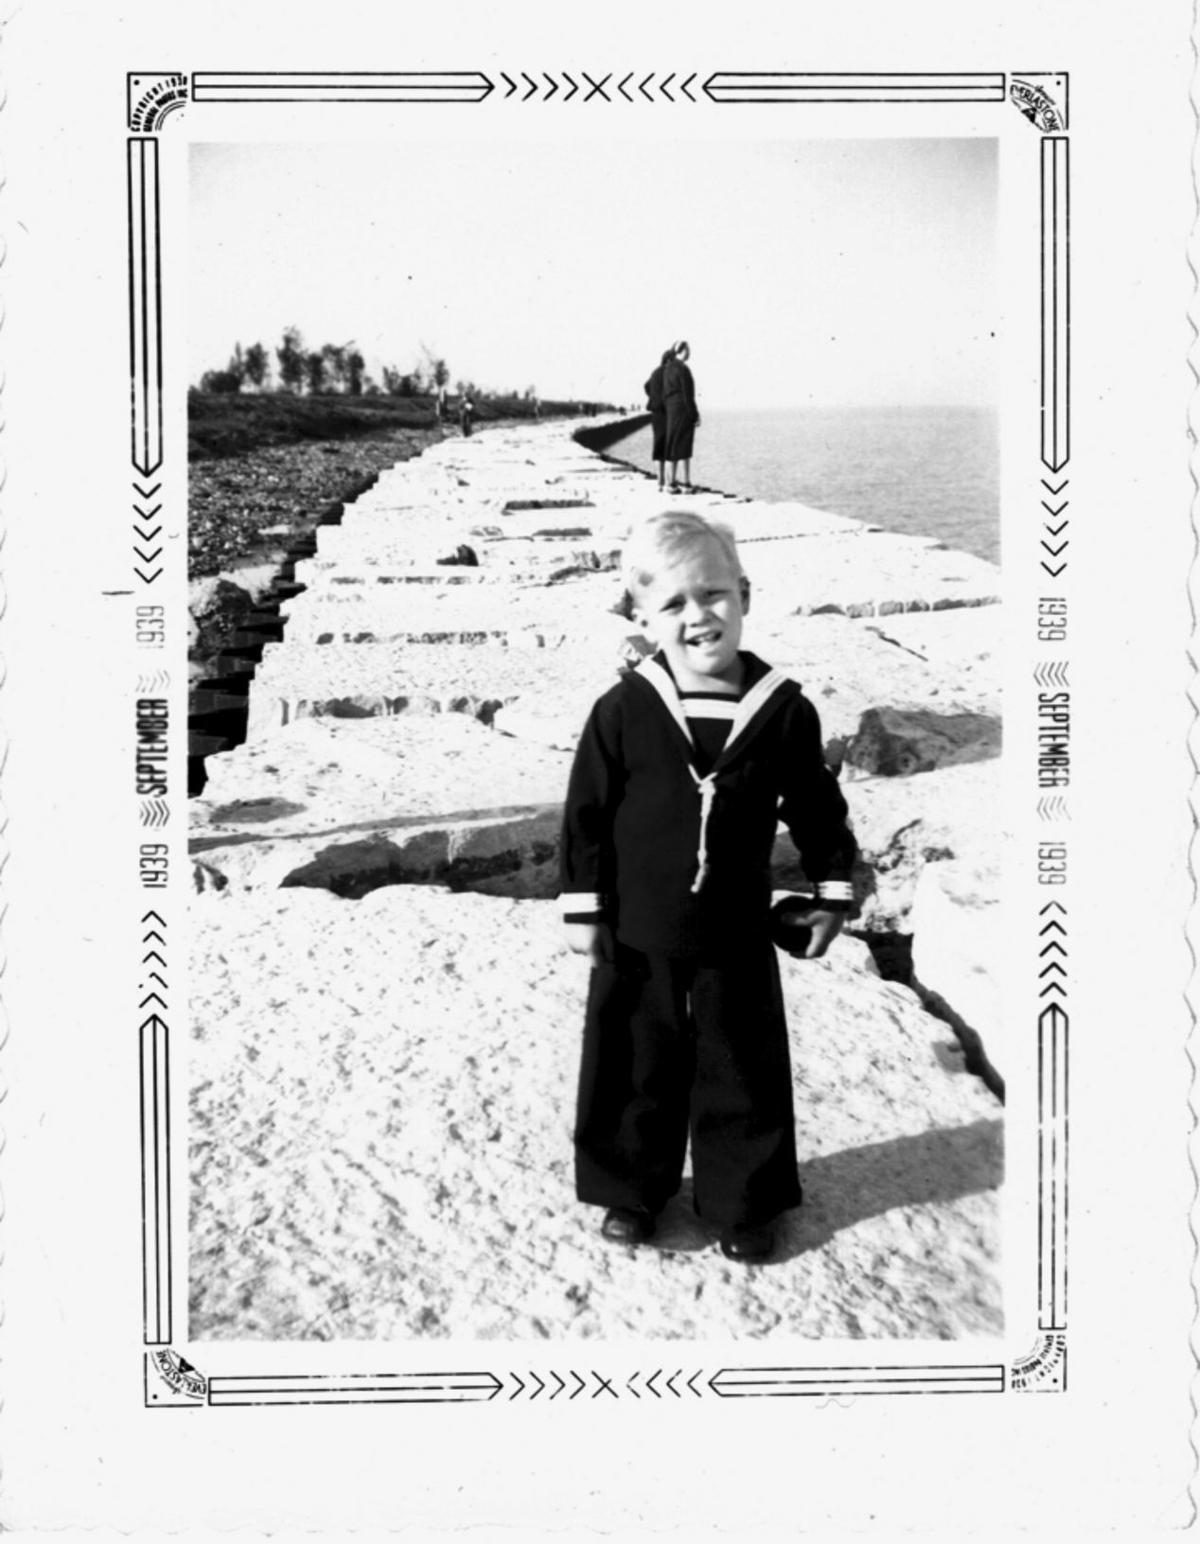 180523-AE_LL_WesWesselhoeft Child